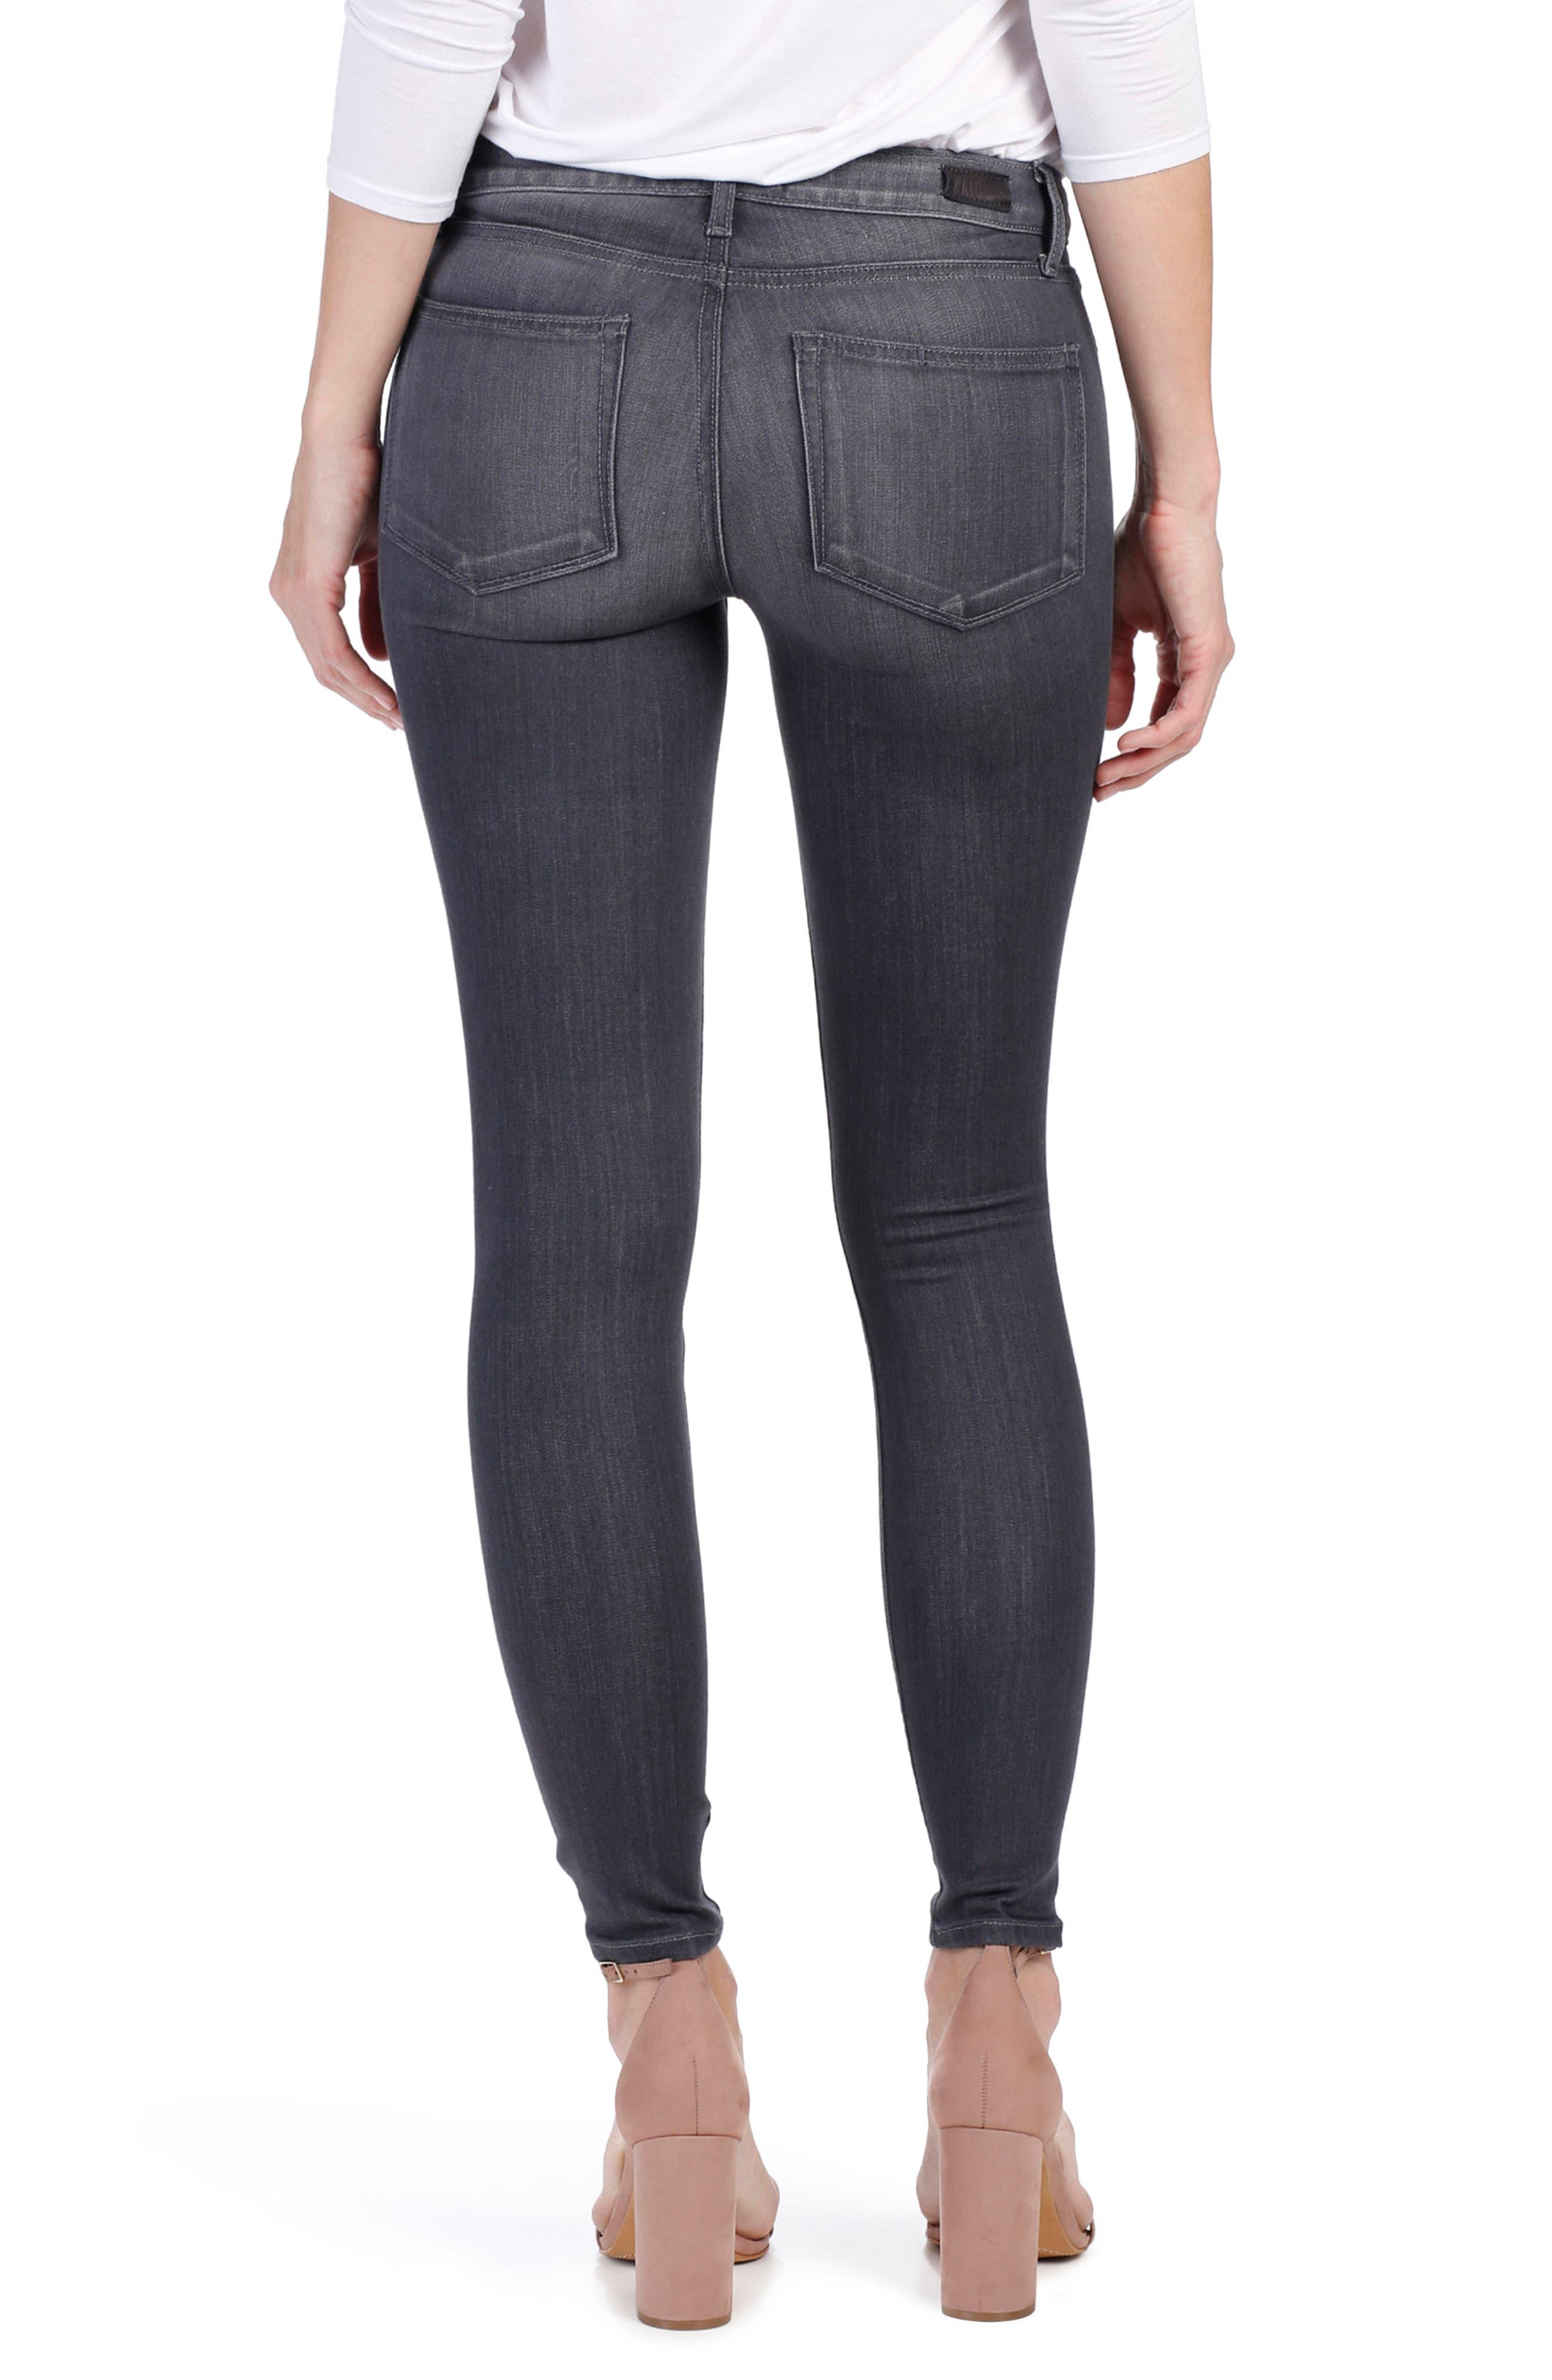 Transcend - Verdugo Ankle Skinny Jeans,                             Alternate thumbnail 3, color,                             020